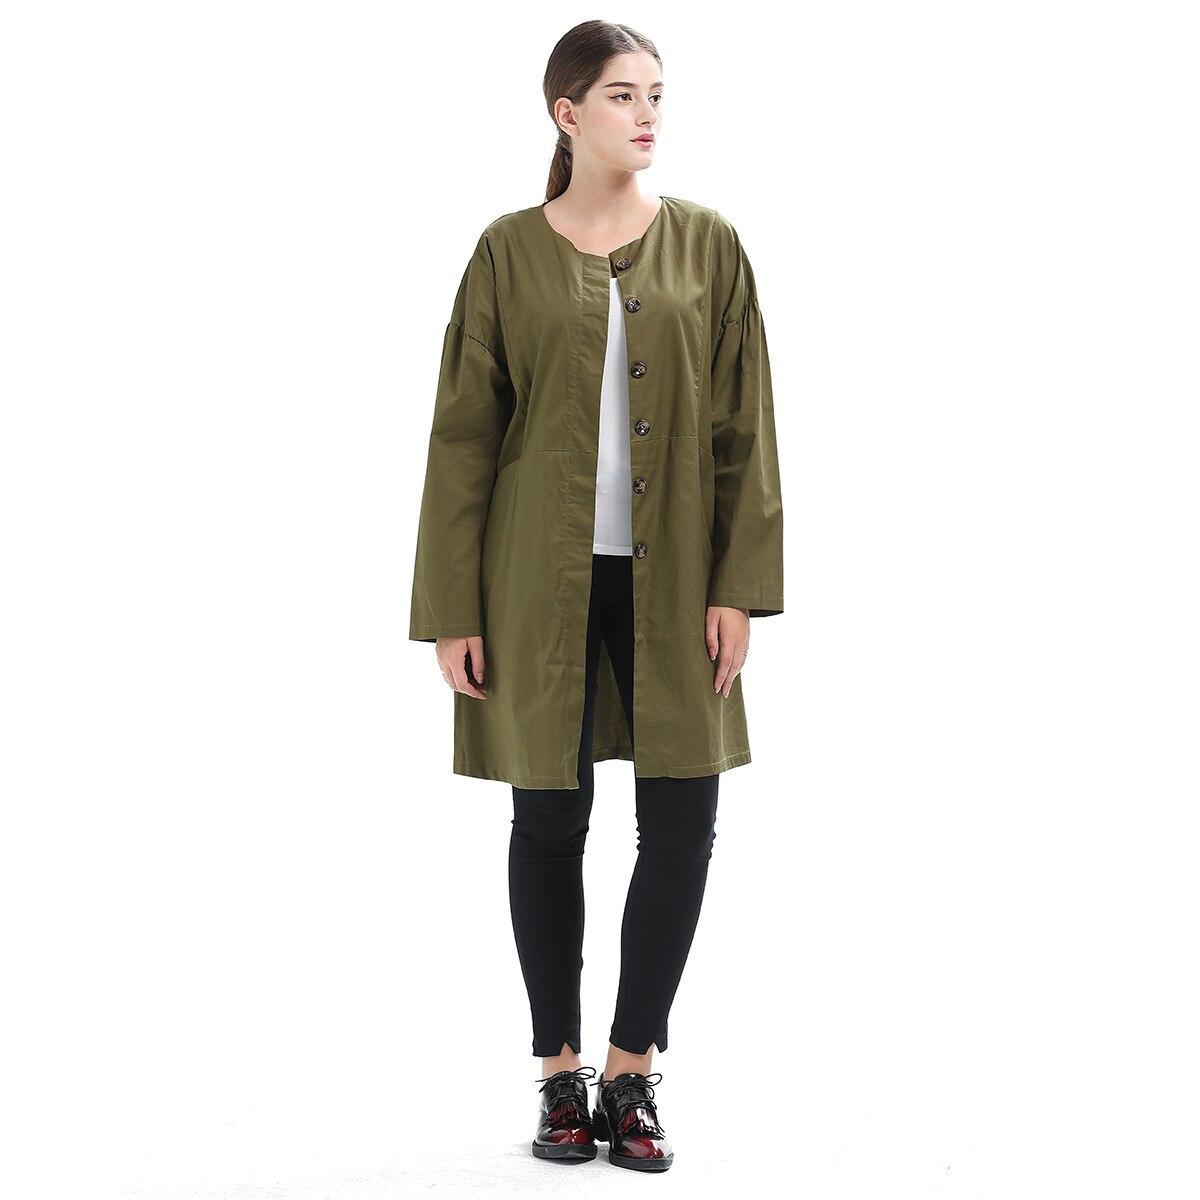 Denim Trench Coat Cotton Casual Lace Full Real Casaco Feminino 2018 Spring New Neck Buckle Windbreaker Loose Coat Woman Tide